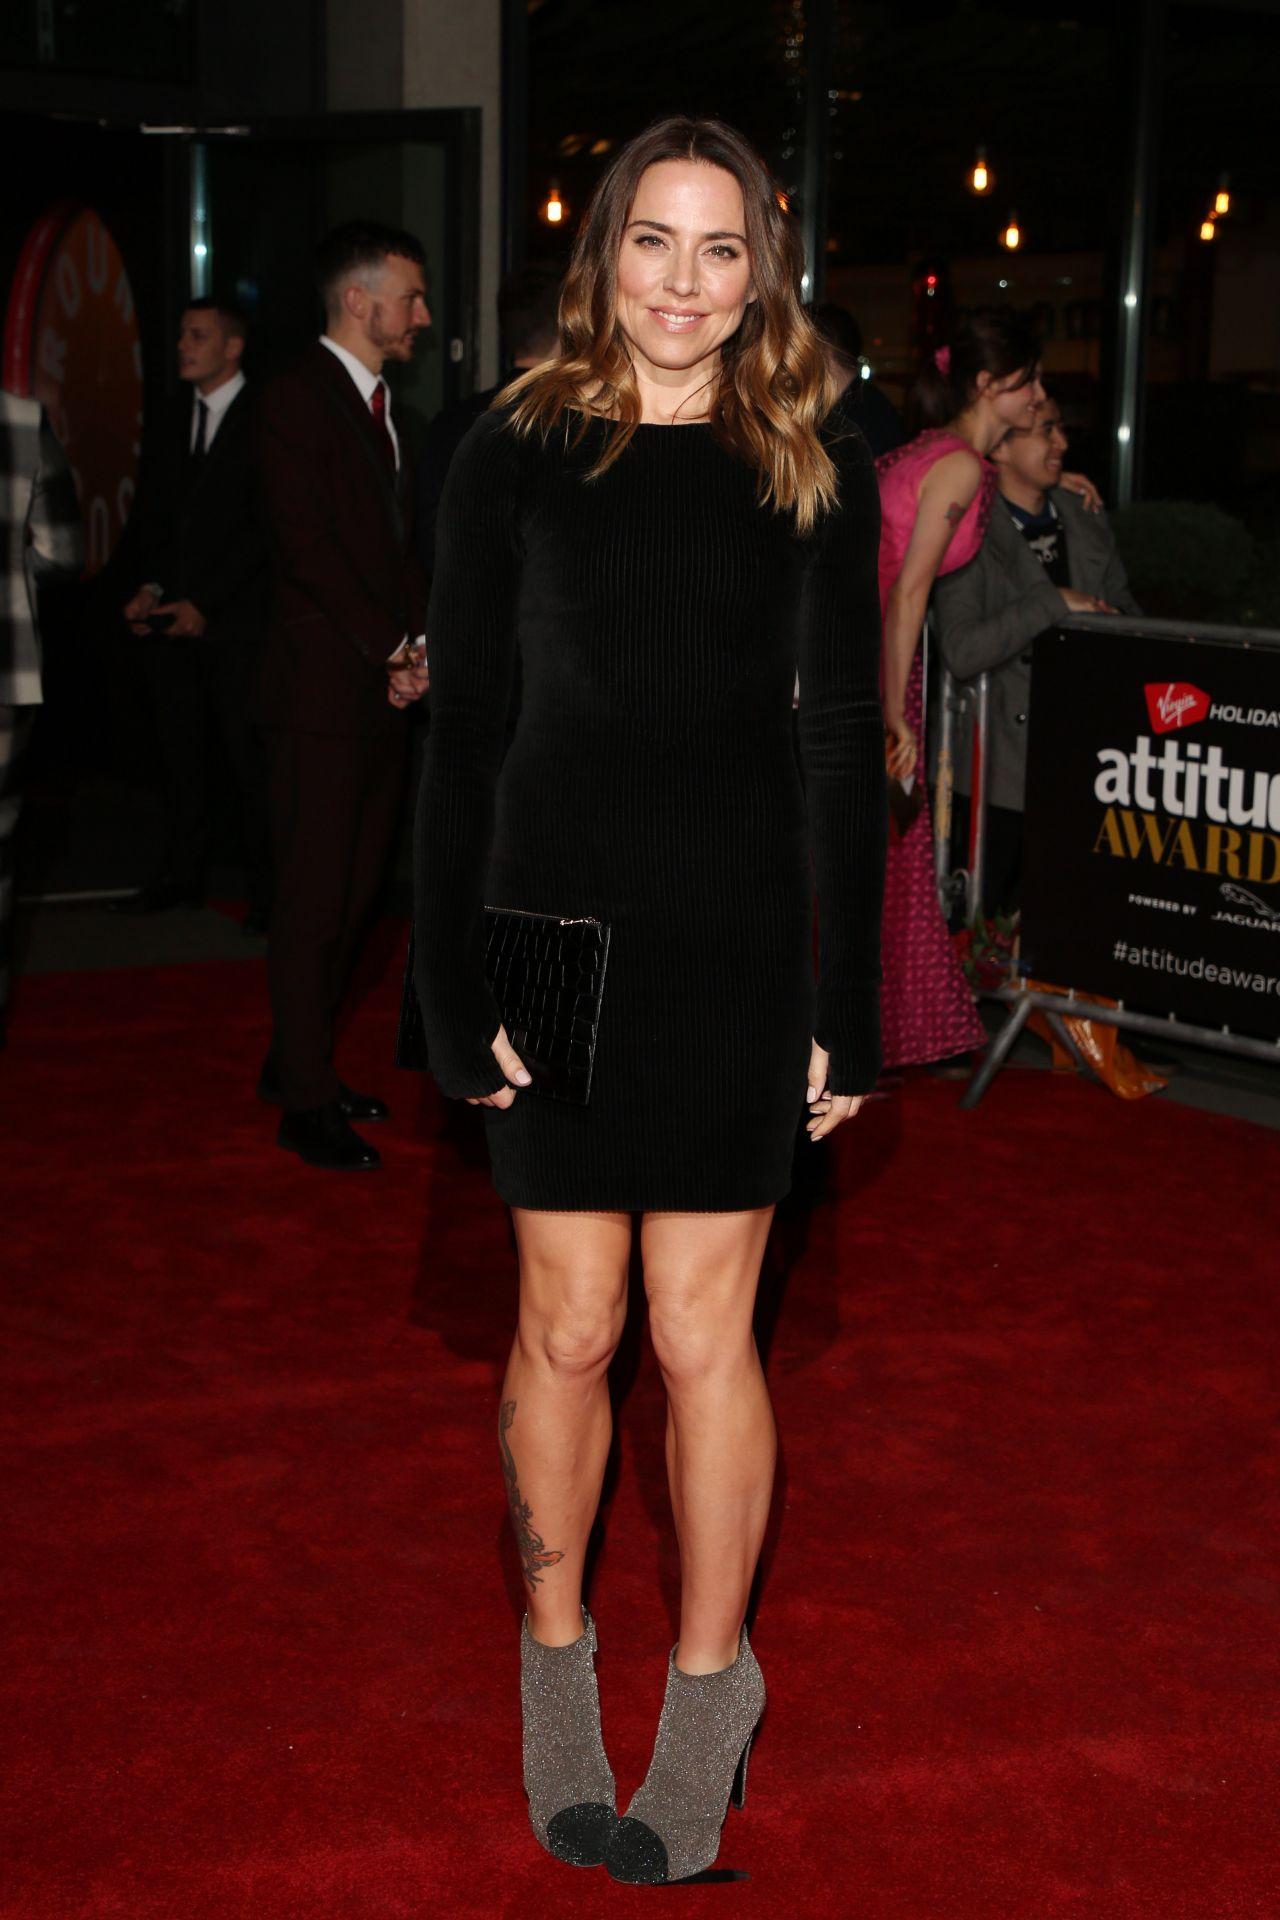 Melanie Chisholm – Attitude Magazine Awards 2017 in London